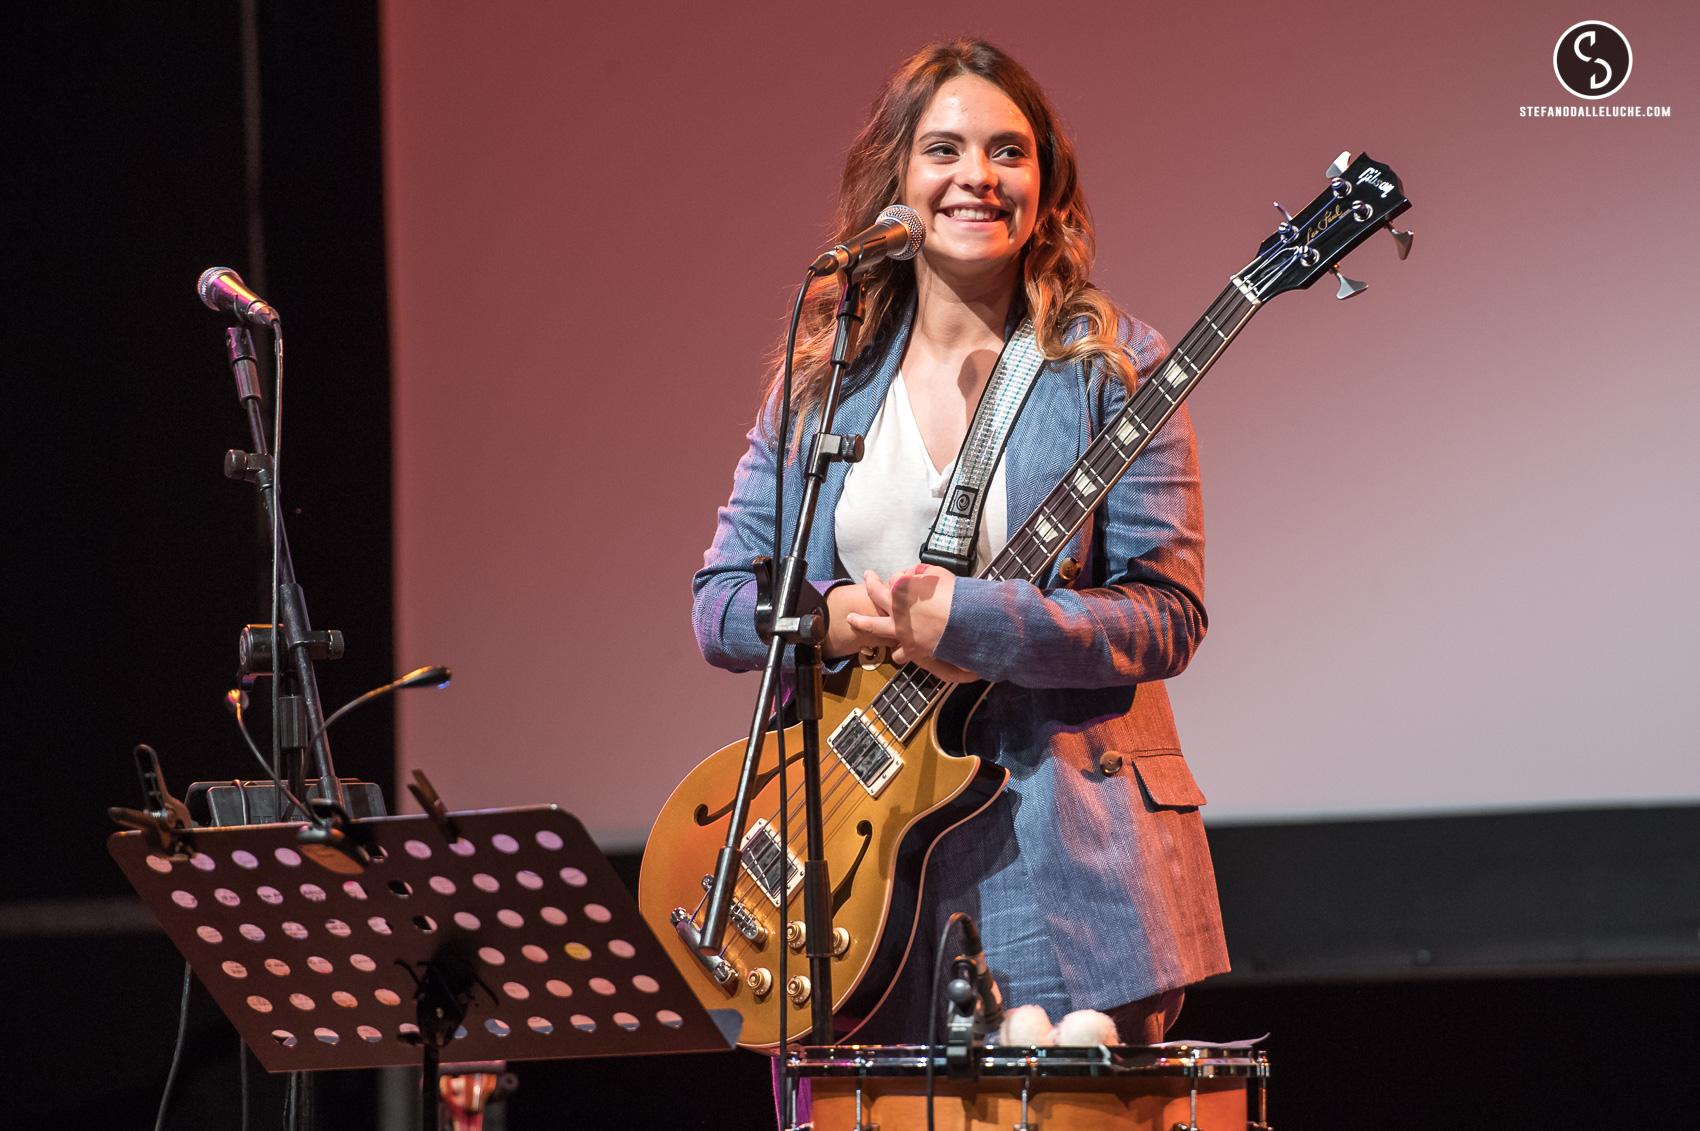 Francesca Michielin al Festival Gaber, la fotogallery